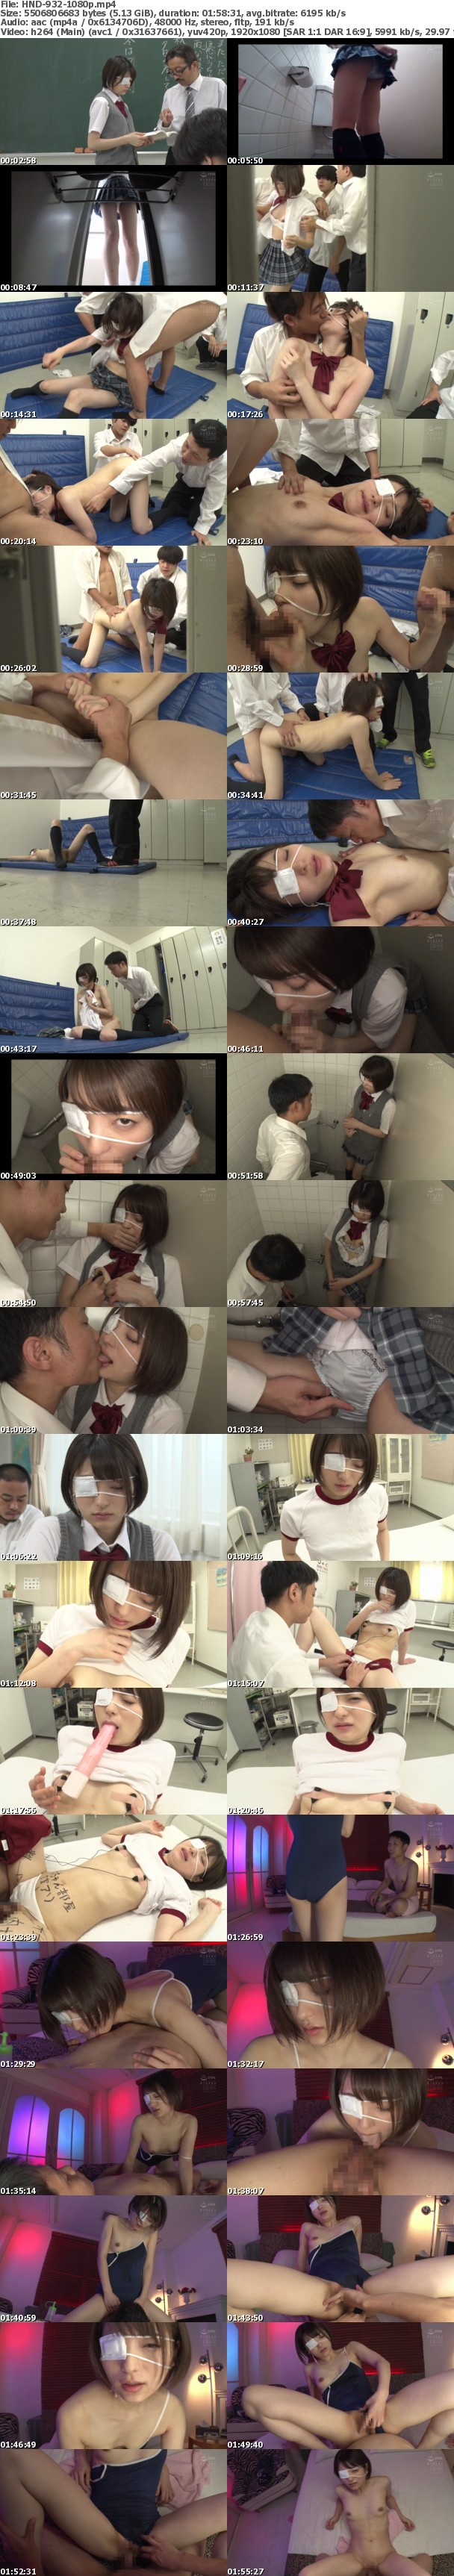 (Full HD) HND-932 ハイエナ姦 レ×プされた後の無口な無気力少女を中出し堕とし 中城葵